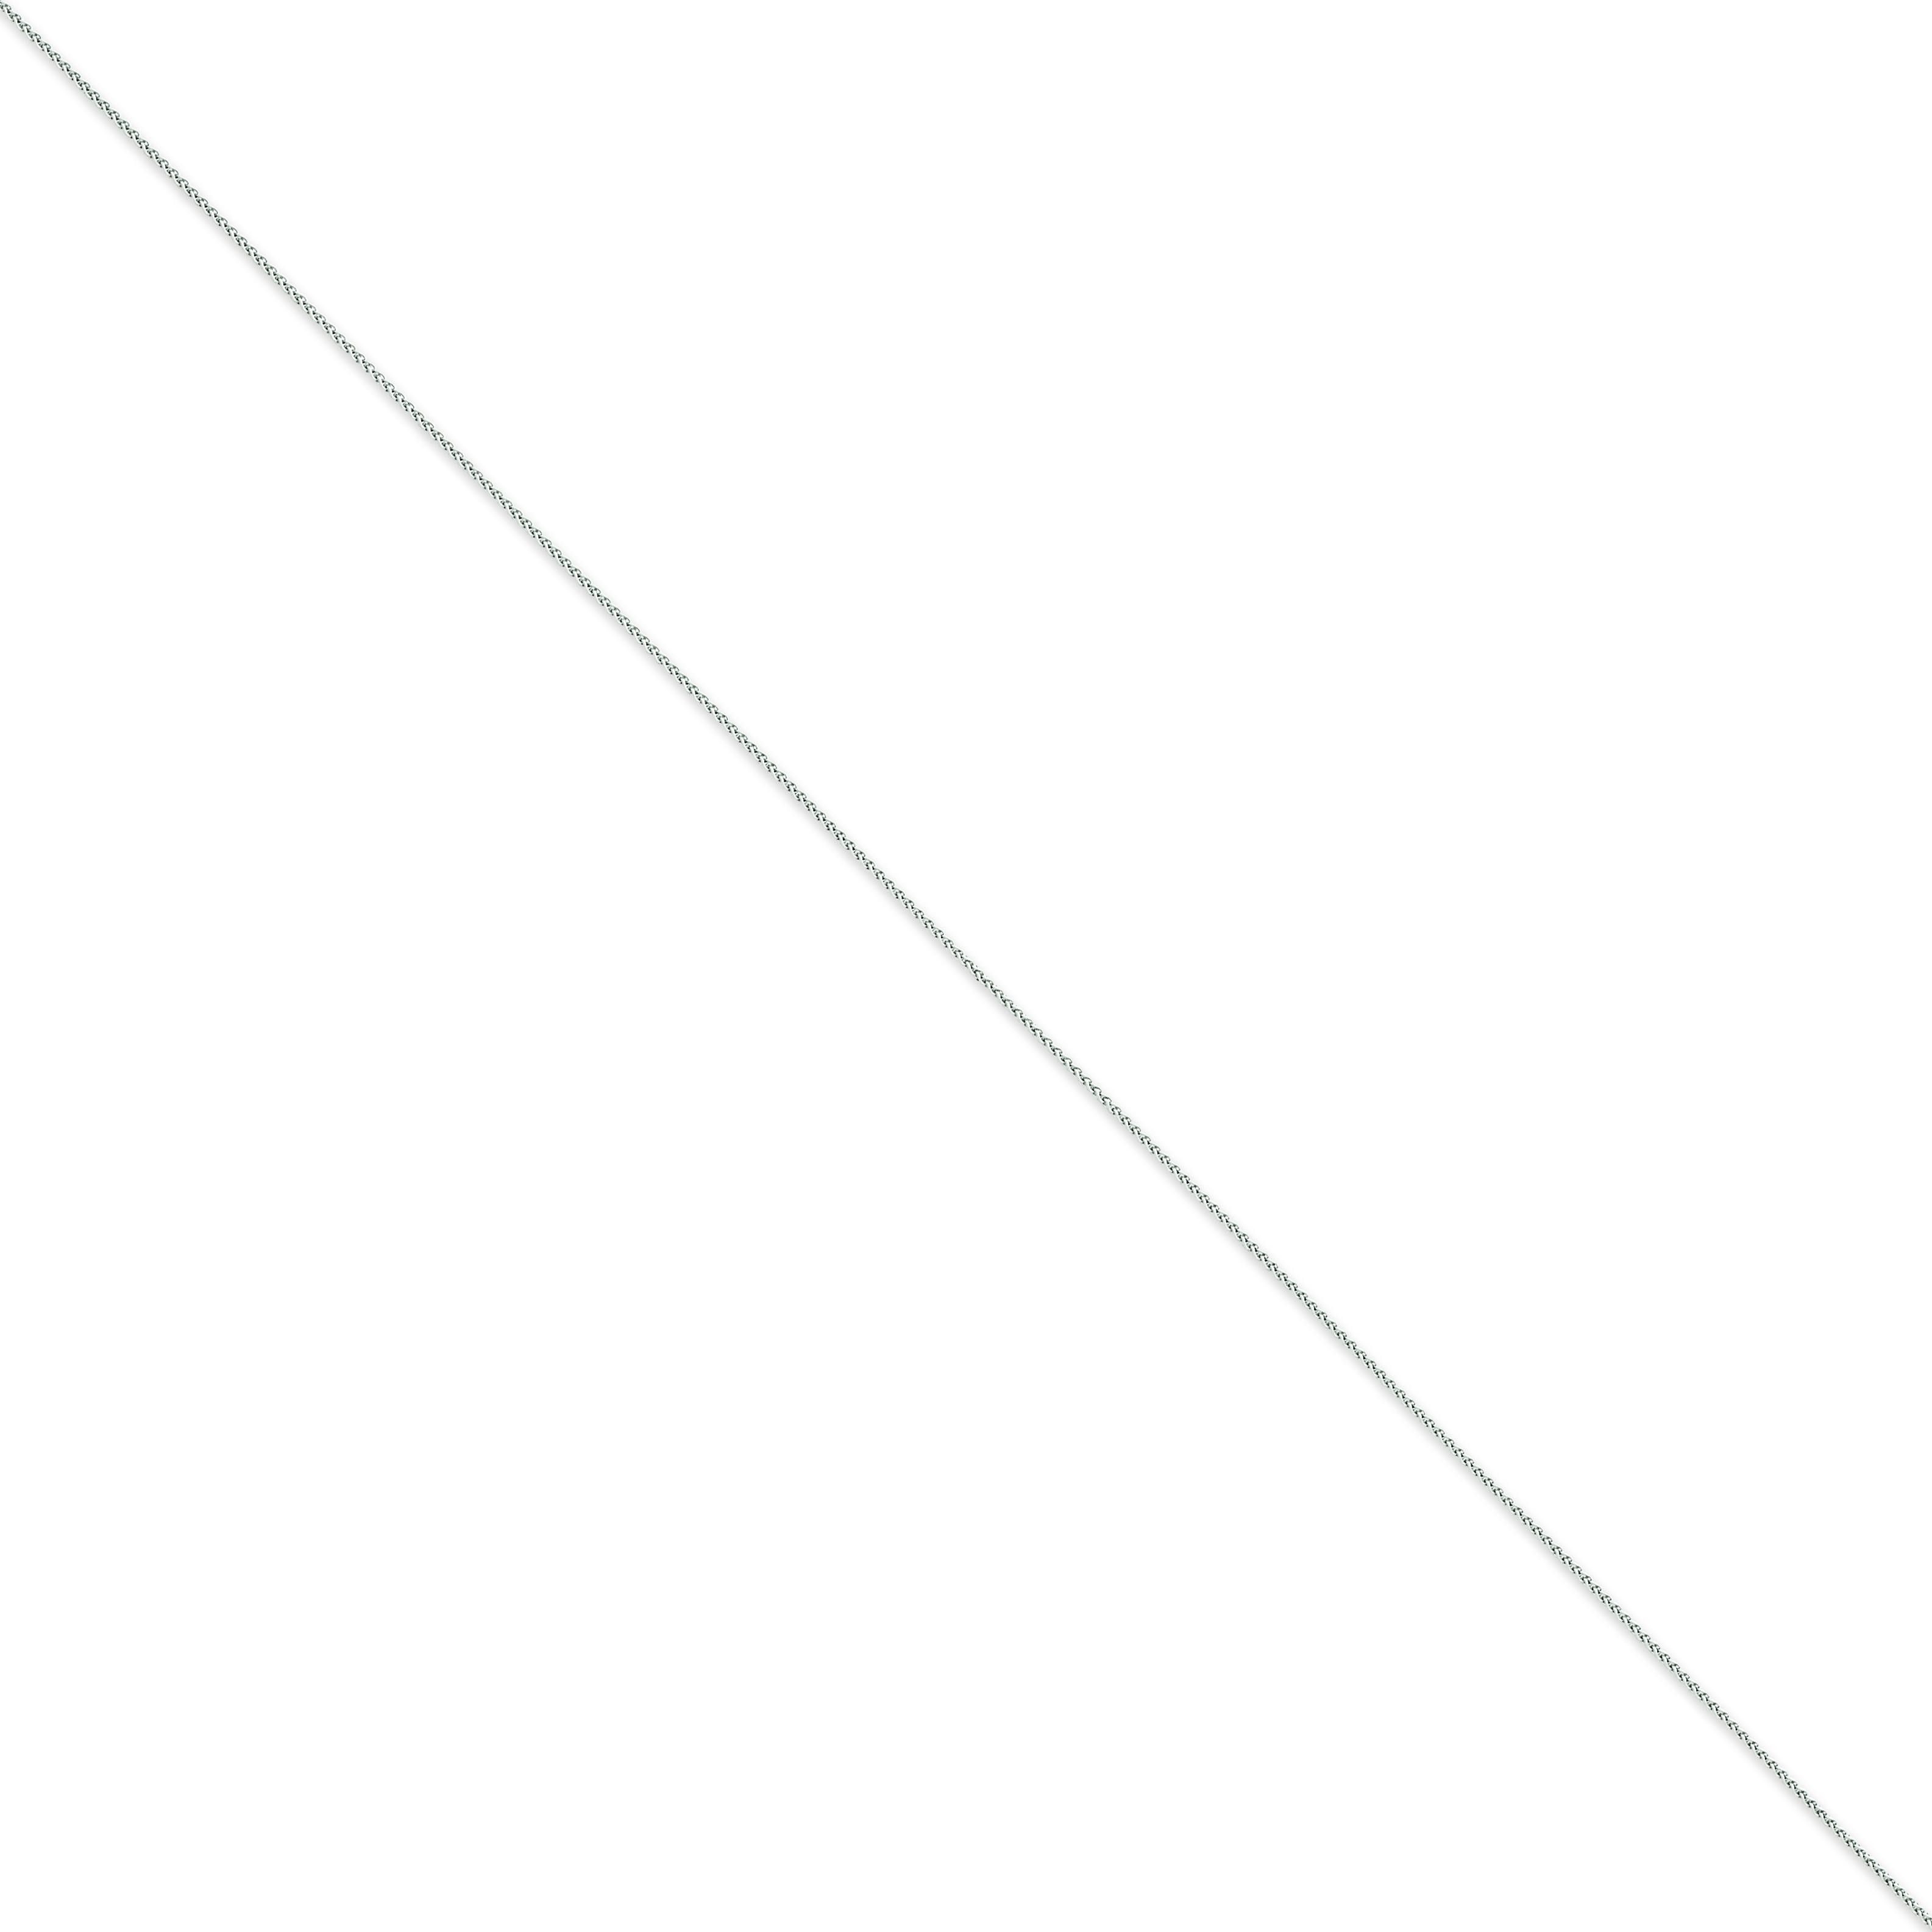 14k Yellow Gold 16 inch 0.80 mm  Spiga Choker Necklace